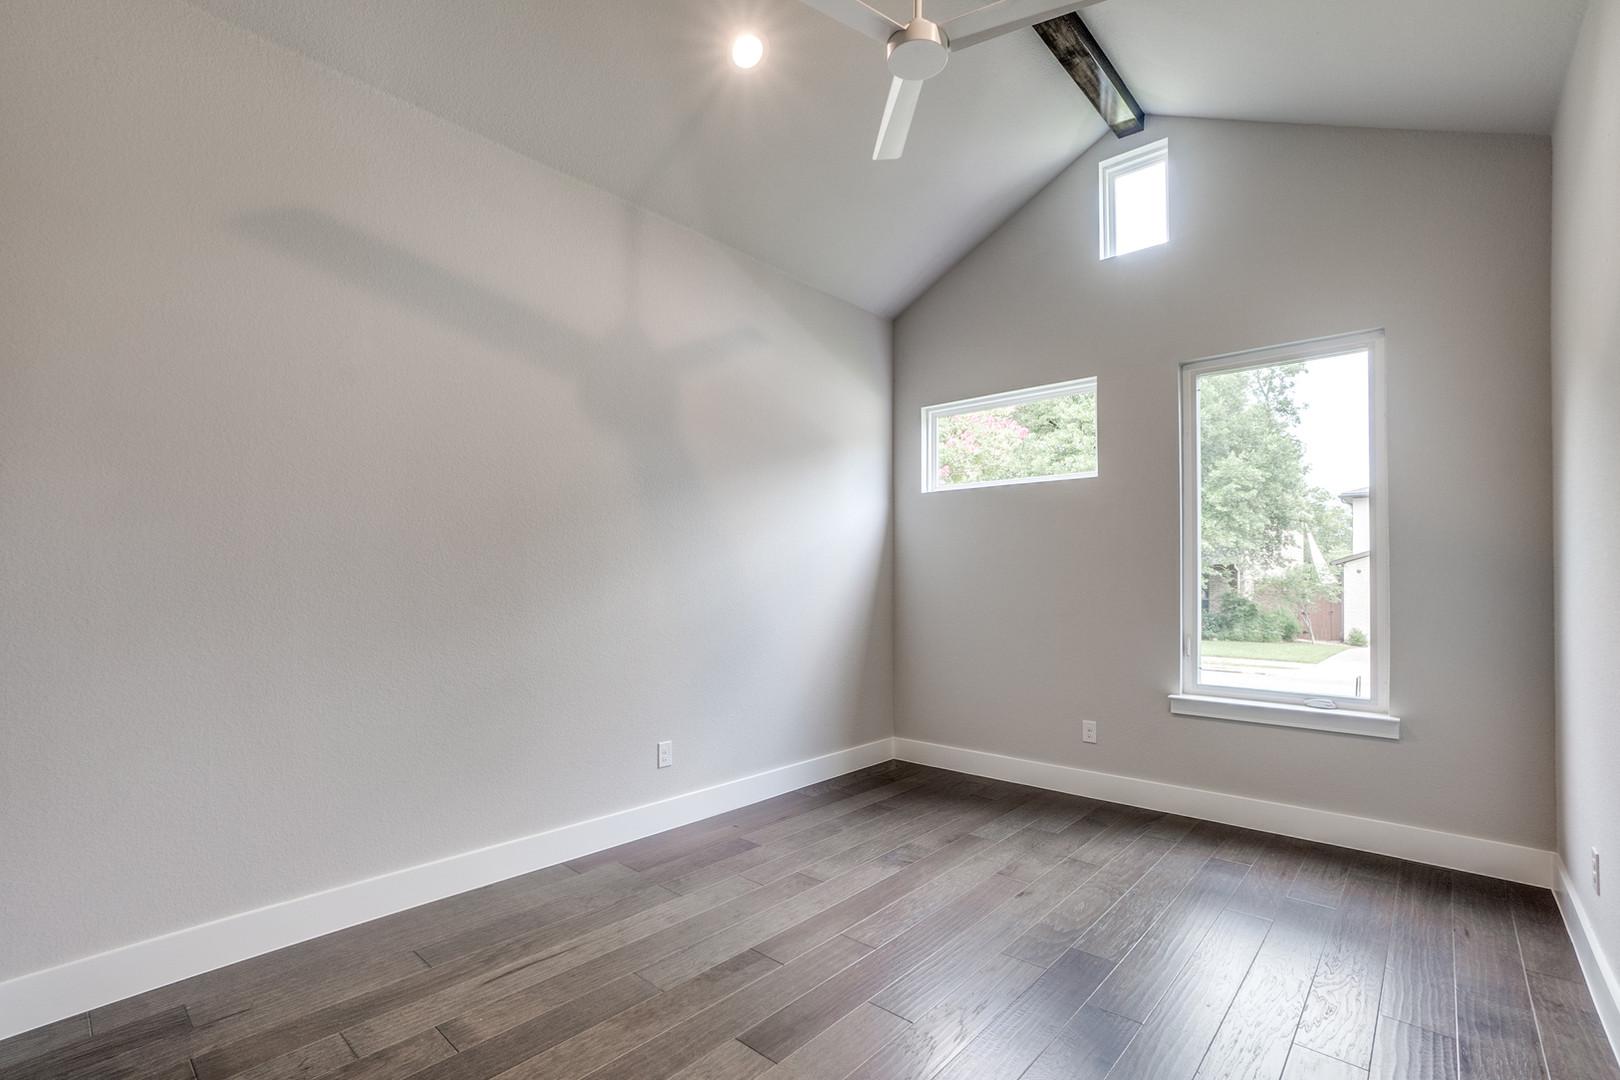 4417-somerville-Bedroom 2 with Vaulted C